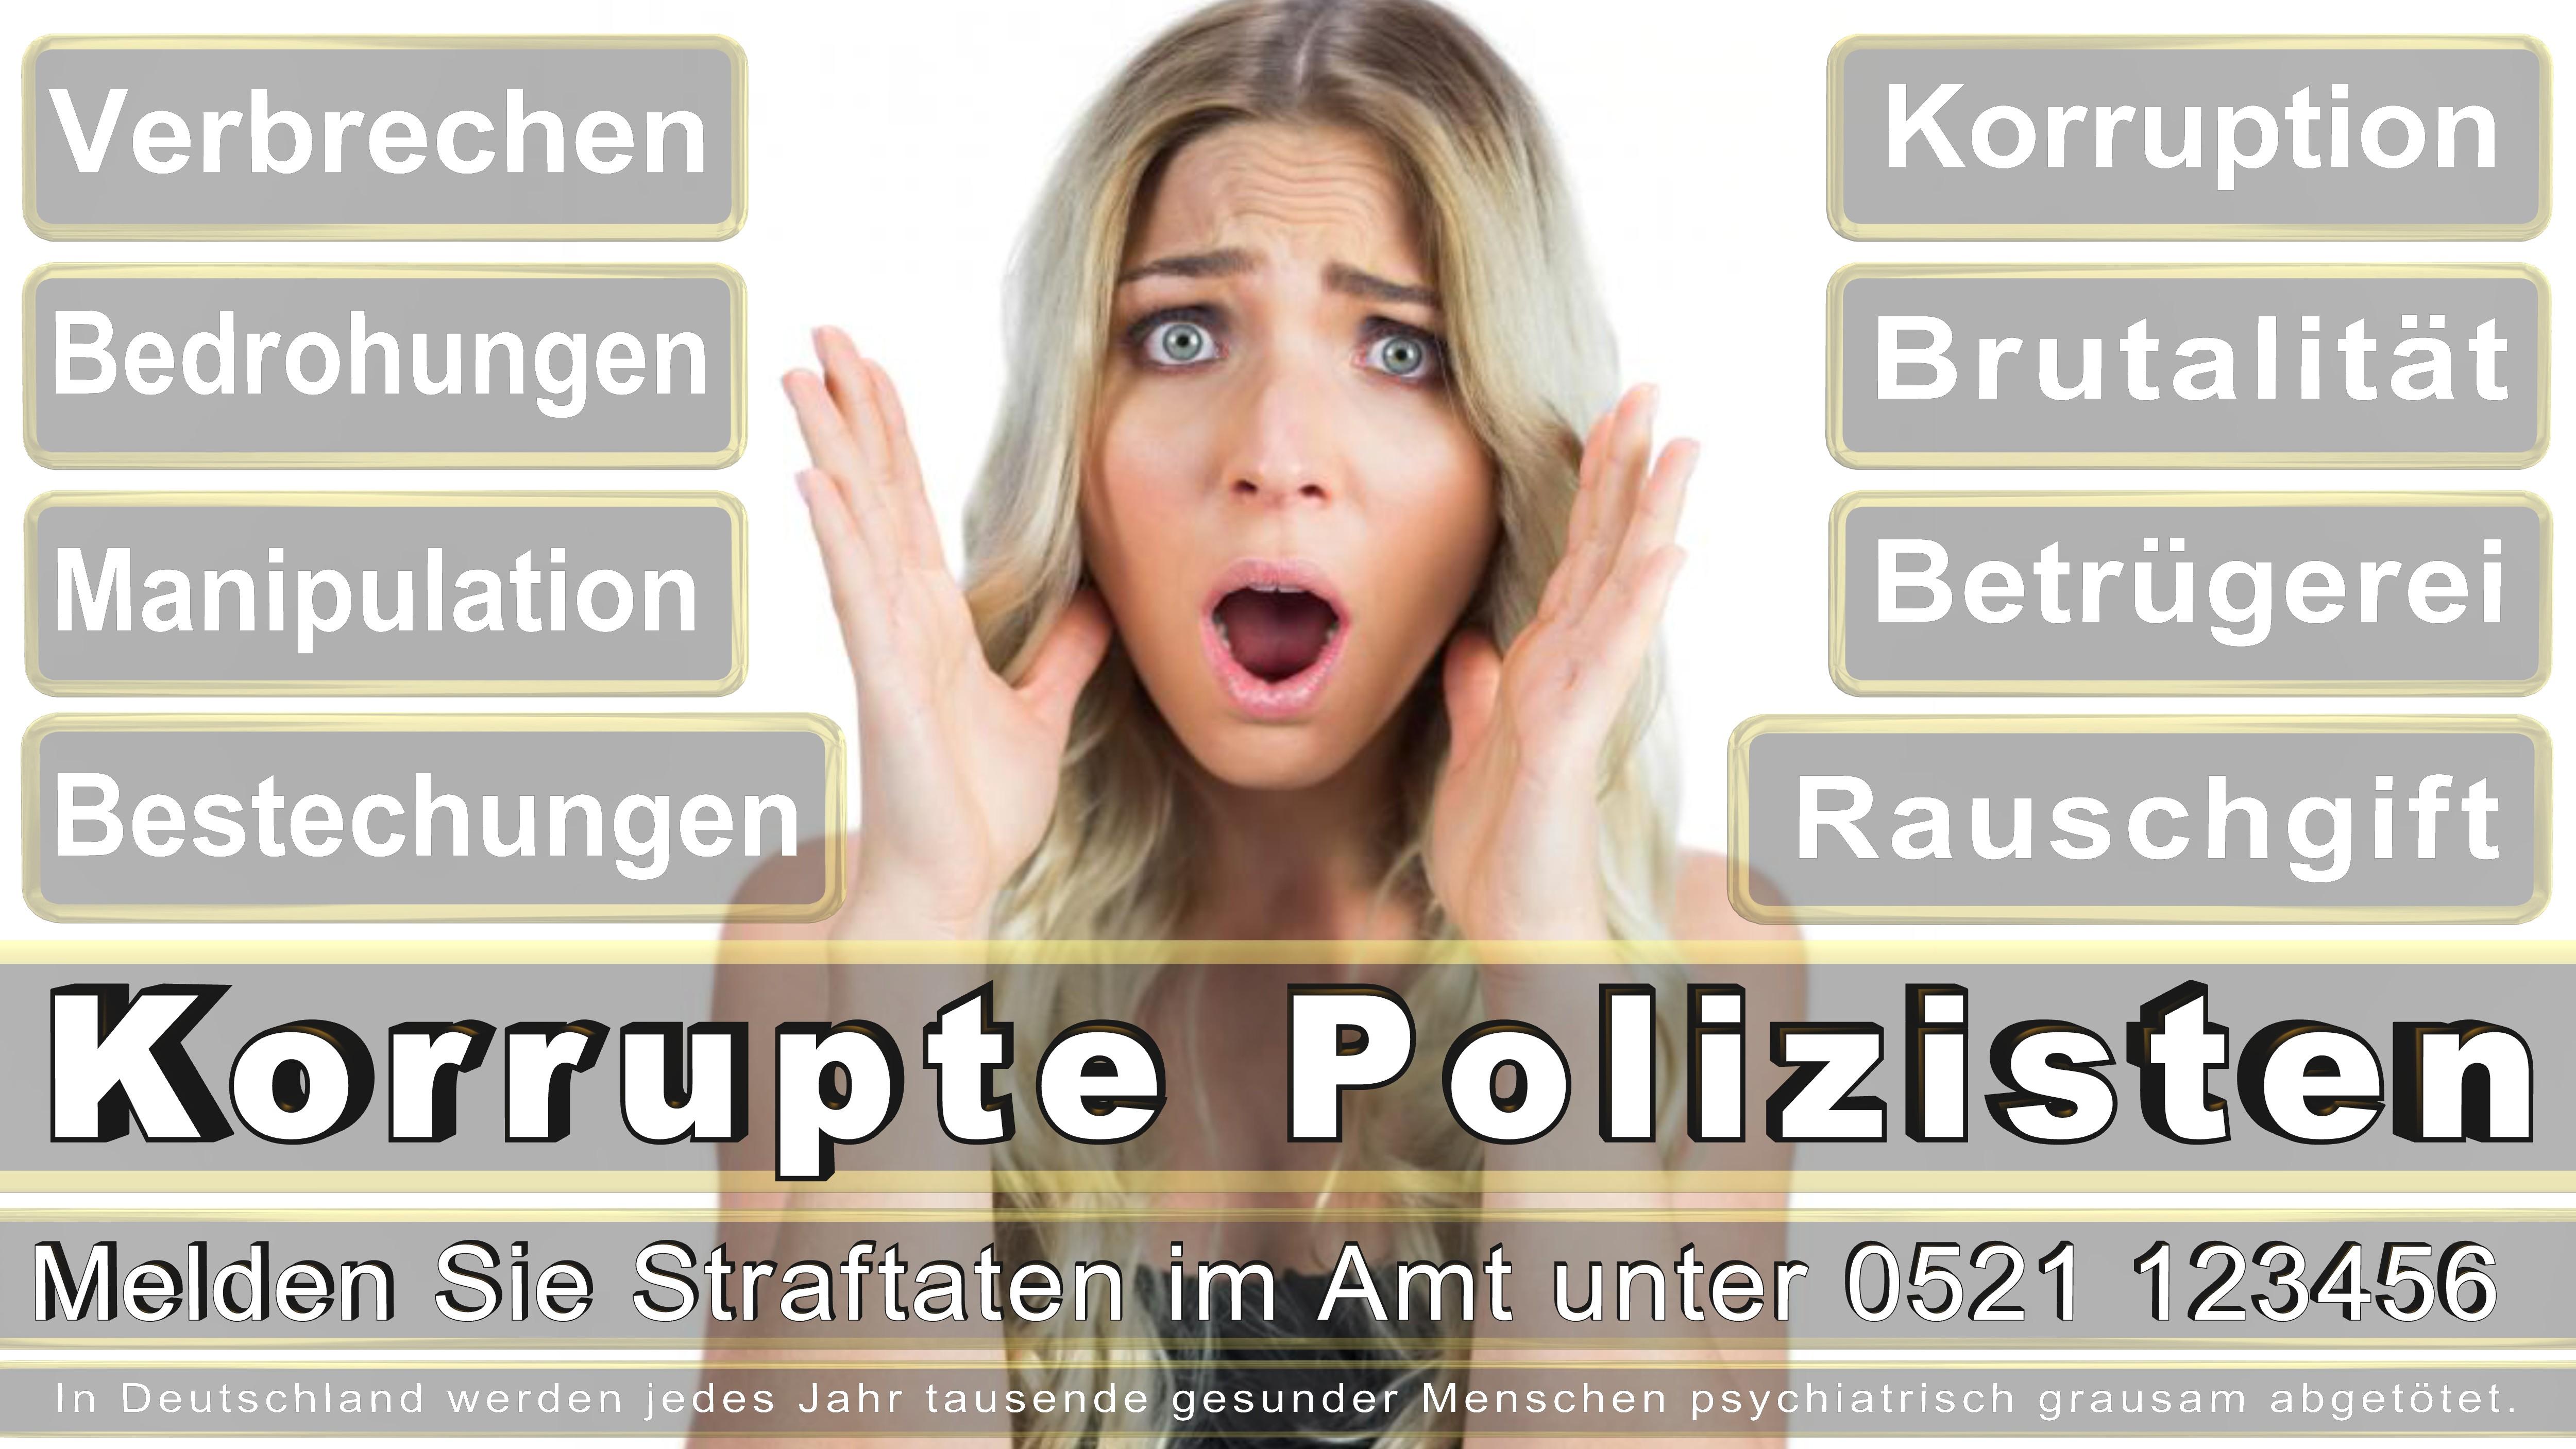 Polizei-Bielefeld-Polizei-Bielefeld-Polizei-Bielefeld (183)